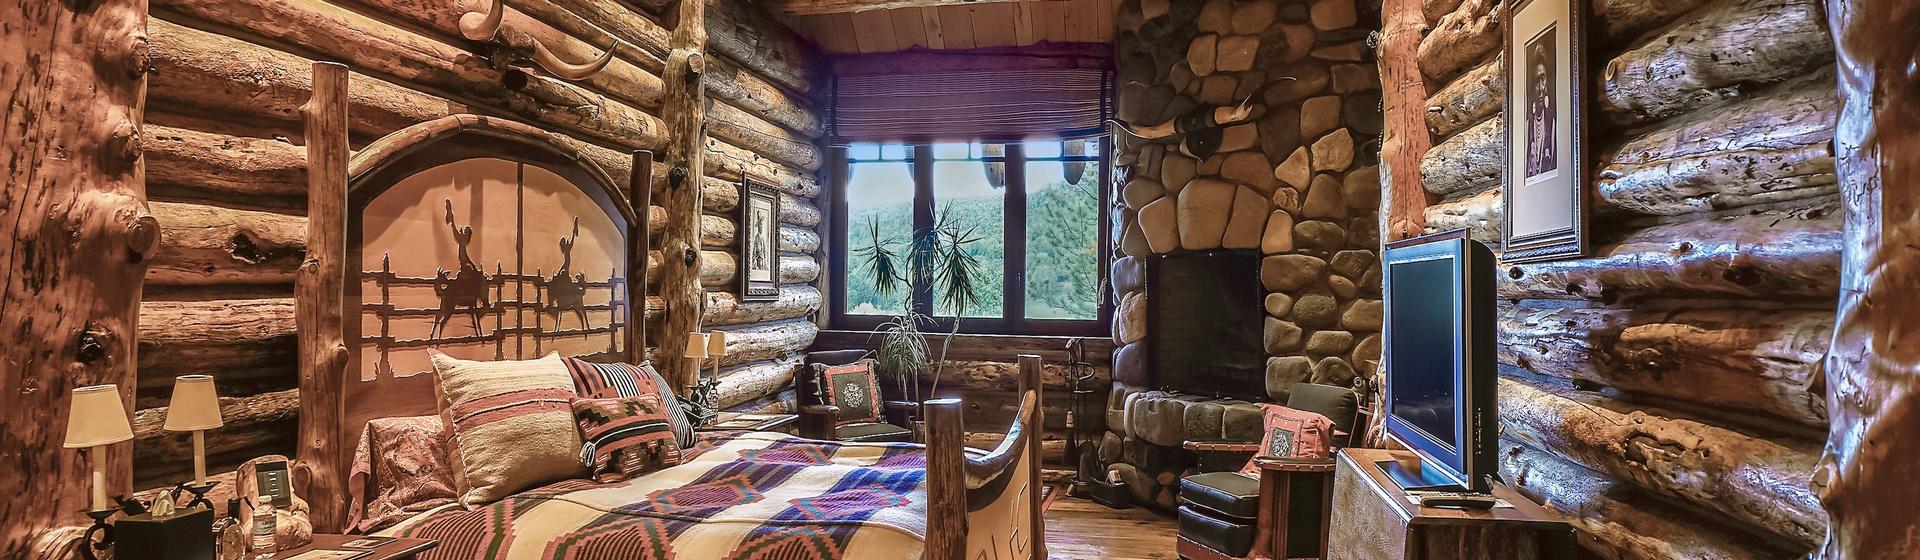 7.1-Telluride-Sleeping-Indian-Ranch-master-bedroom-C-web.JPG